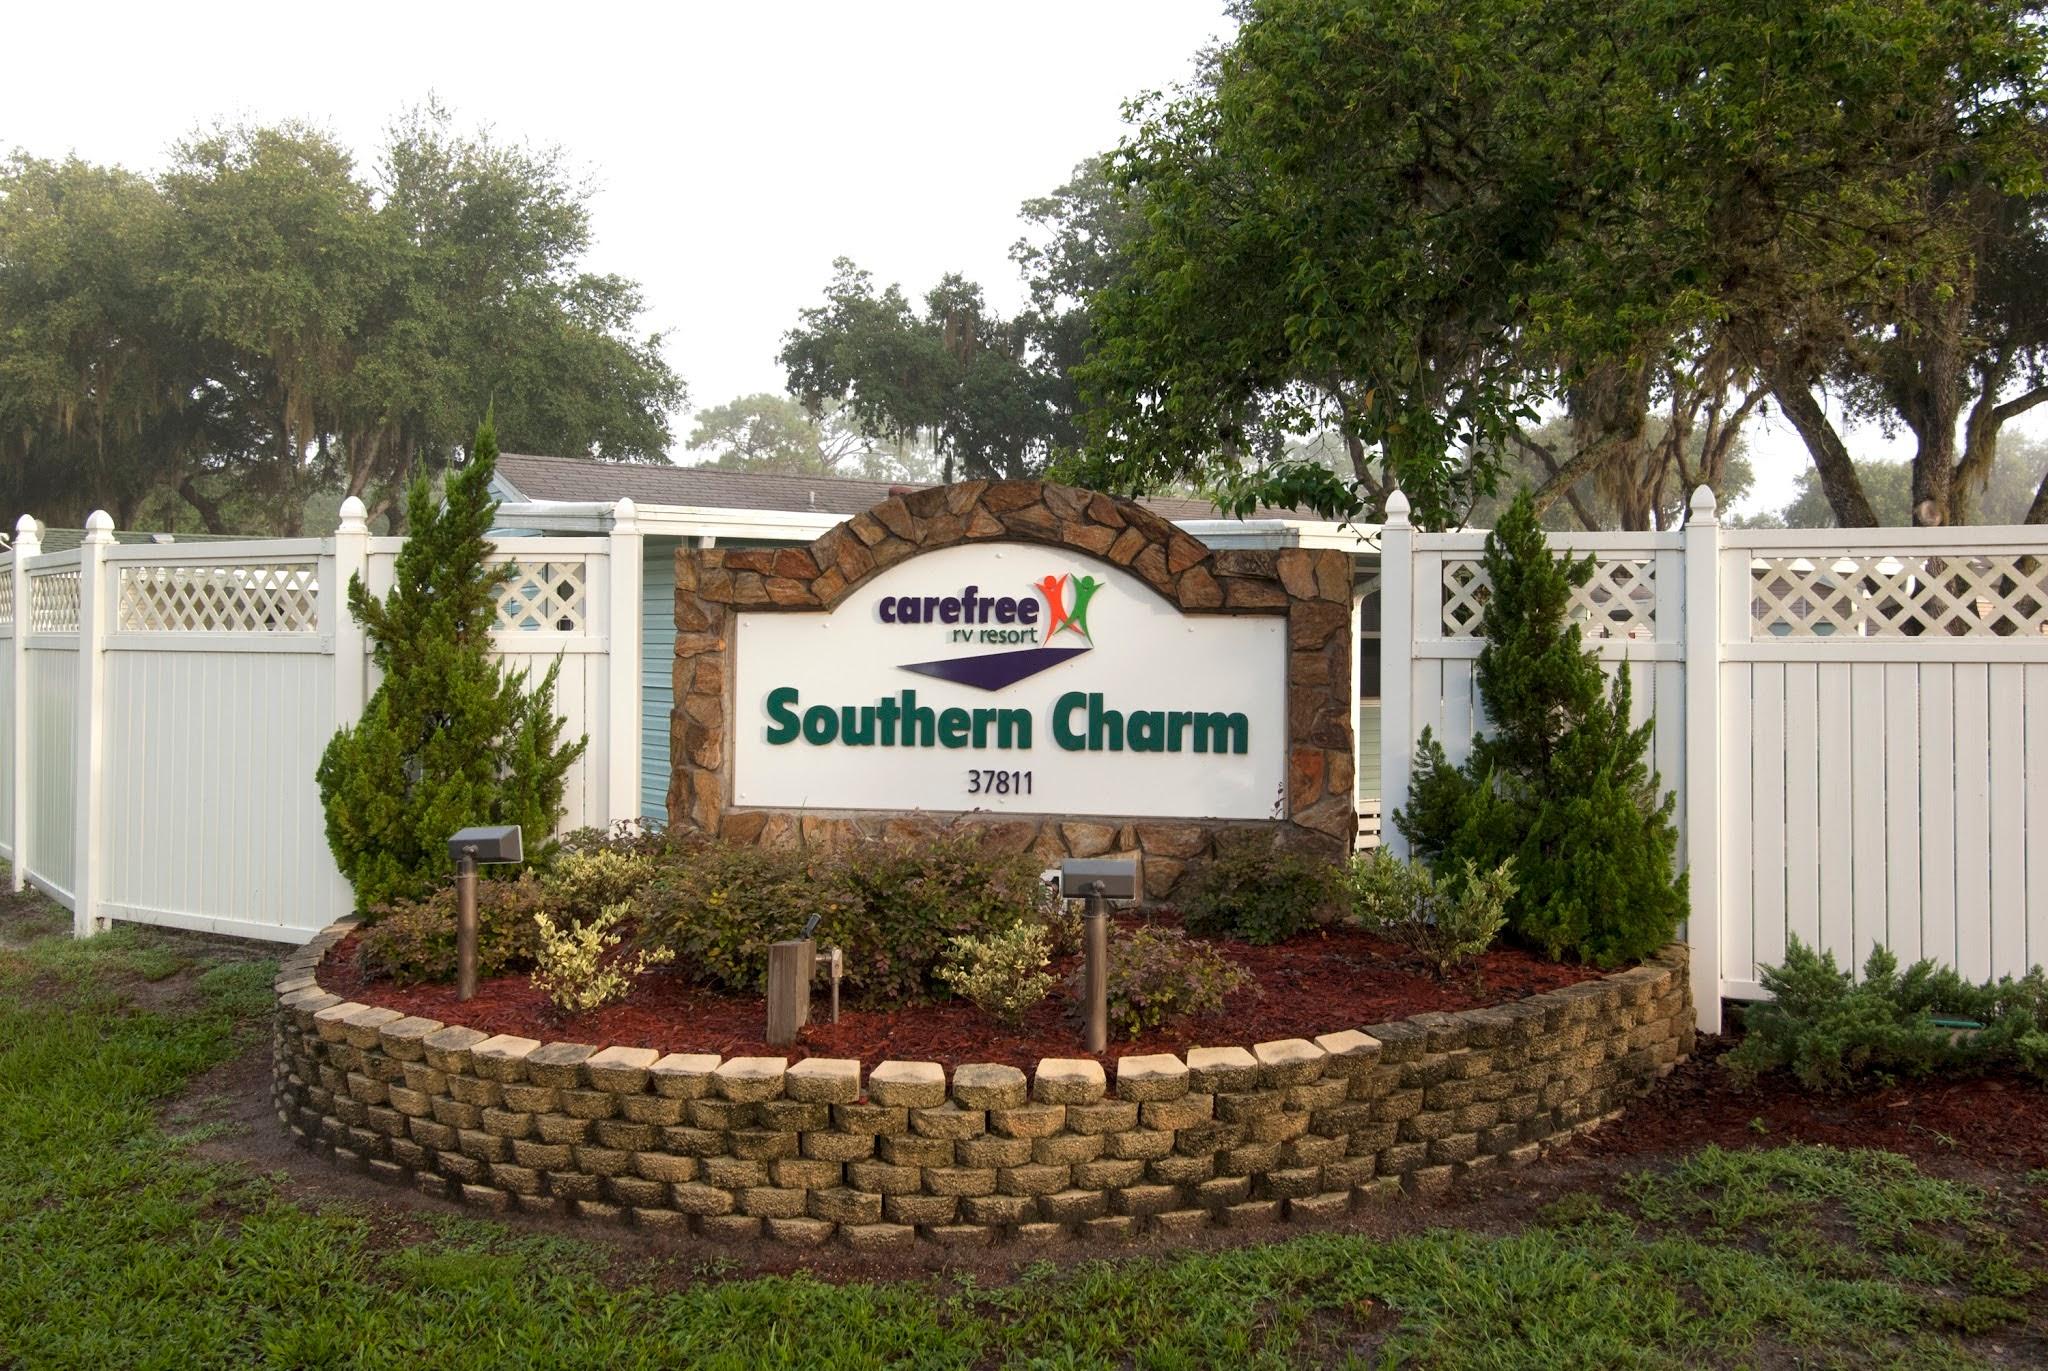 Southern Charm RV Resort